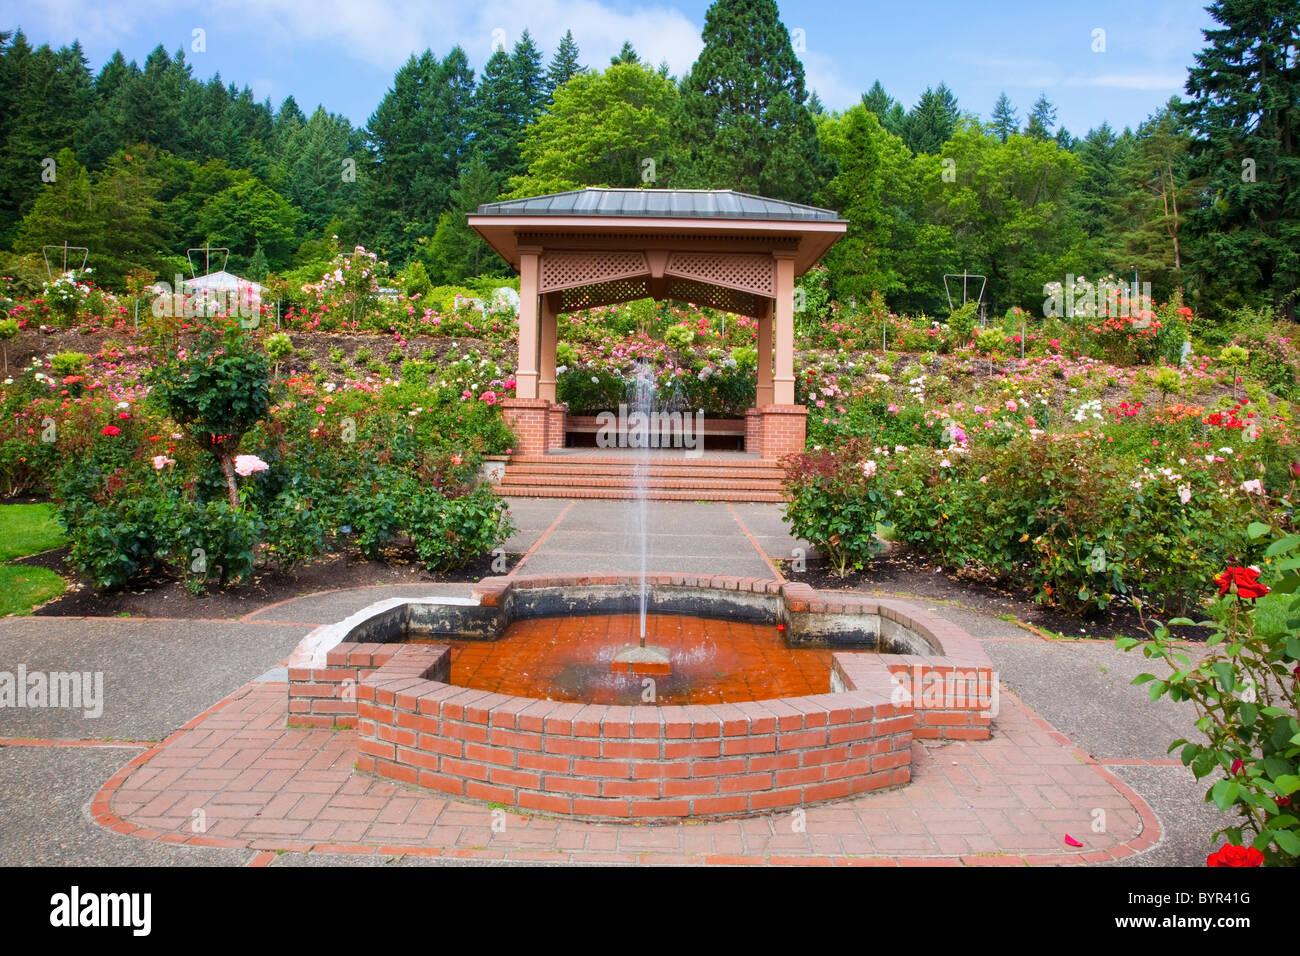 Fountain and gazebo in portland rose garden portland for Garden statues portland oregon